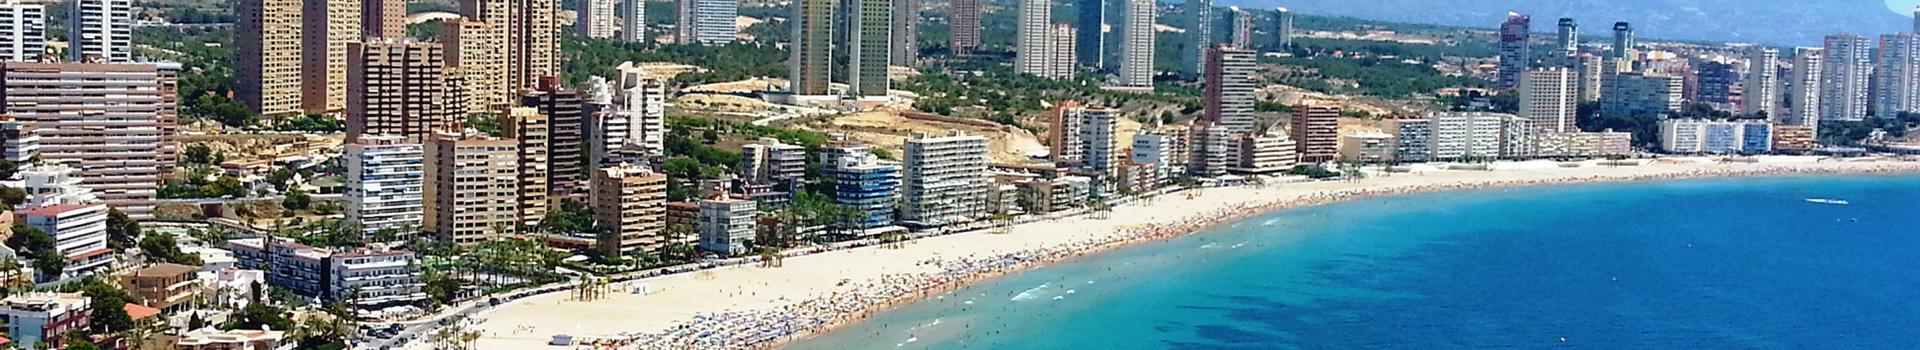 Hotels Benidorm Christmas 2021 Benidorm Xmas New Year Holidays 2020 2021 Offers To Benidorm Logitravel